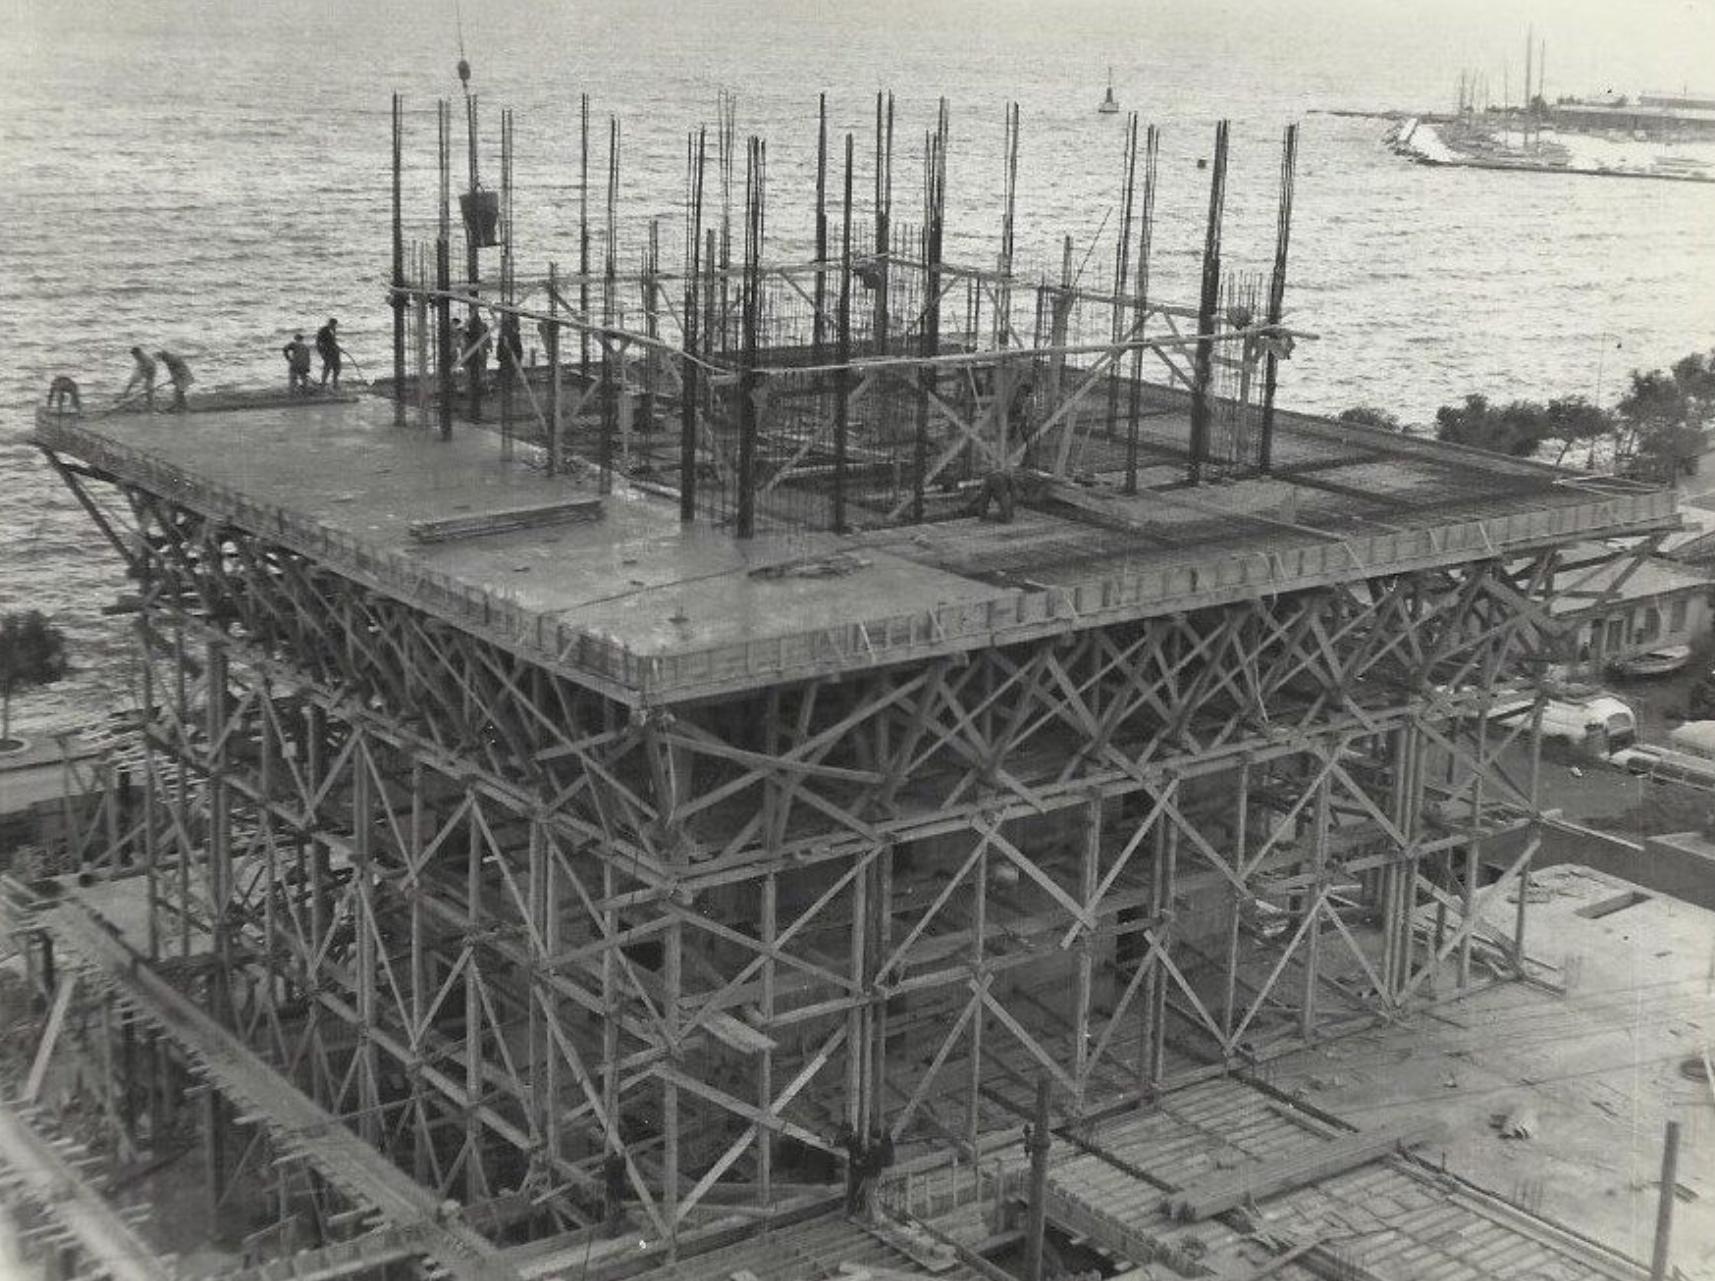 historic photos of Marjan's construction courtesy Emil Strniša